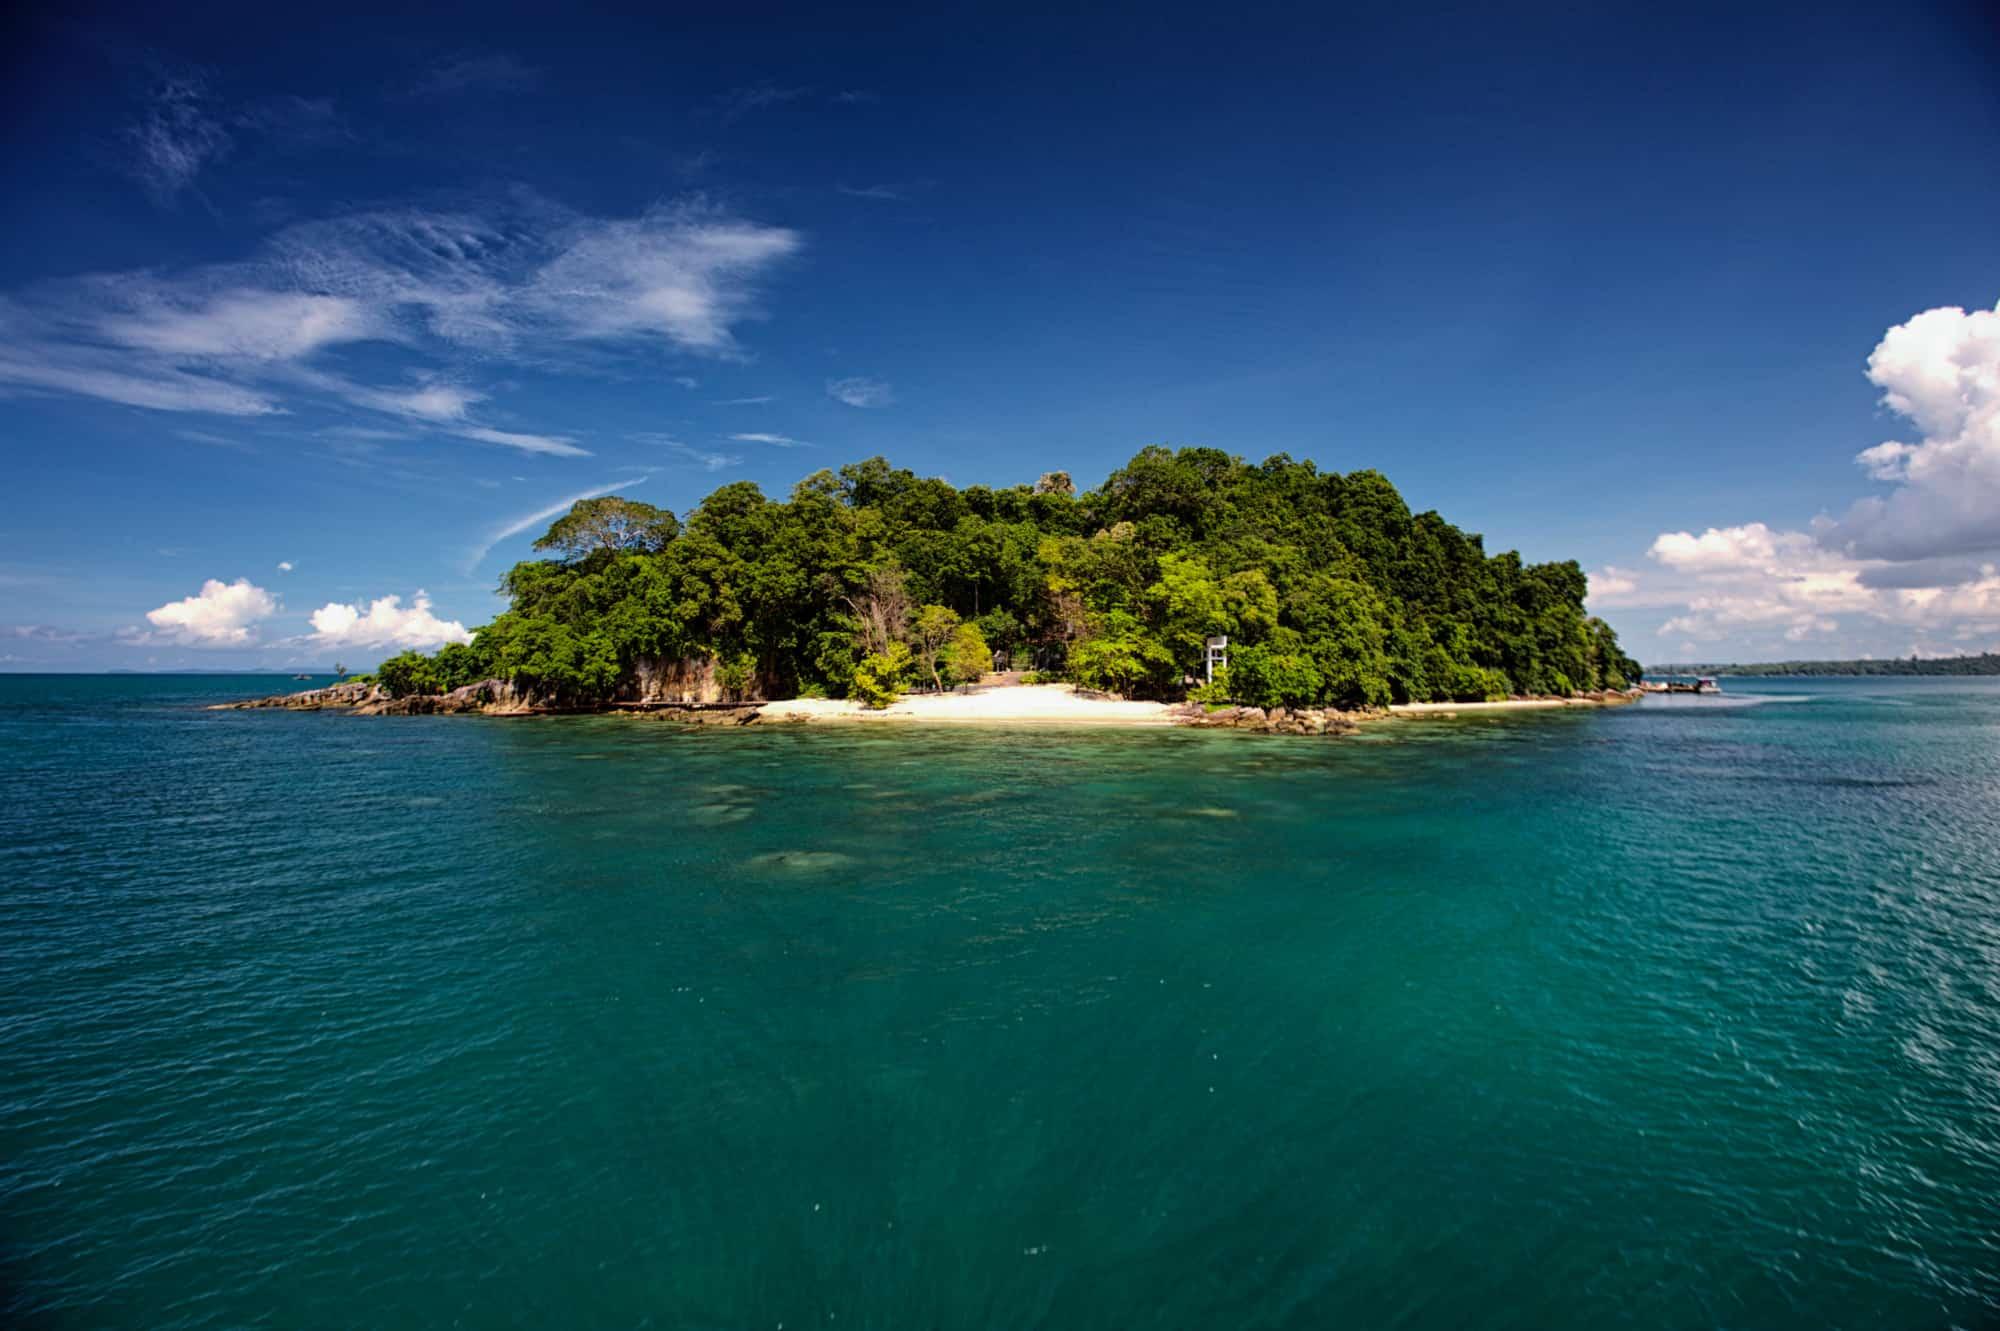 Six Senses Krabey Island in Cambodia